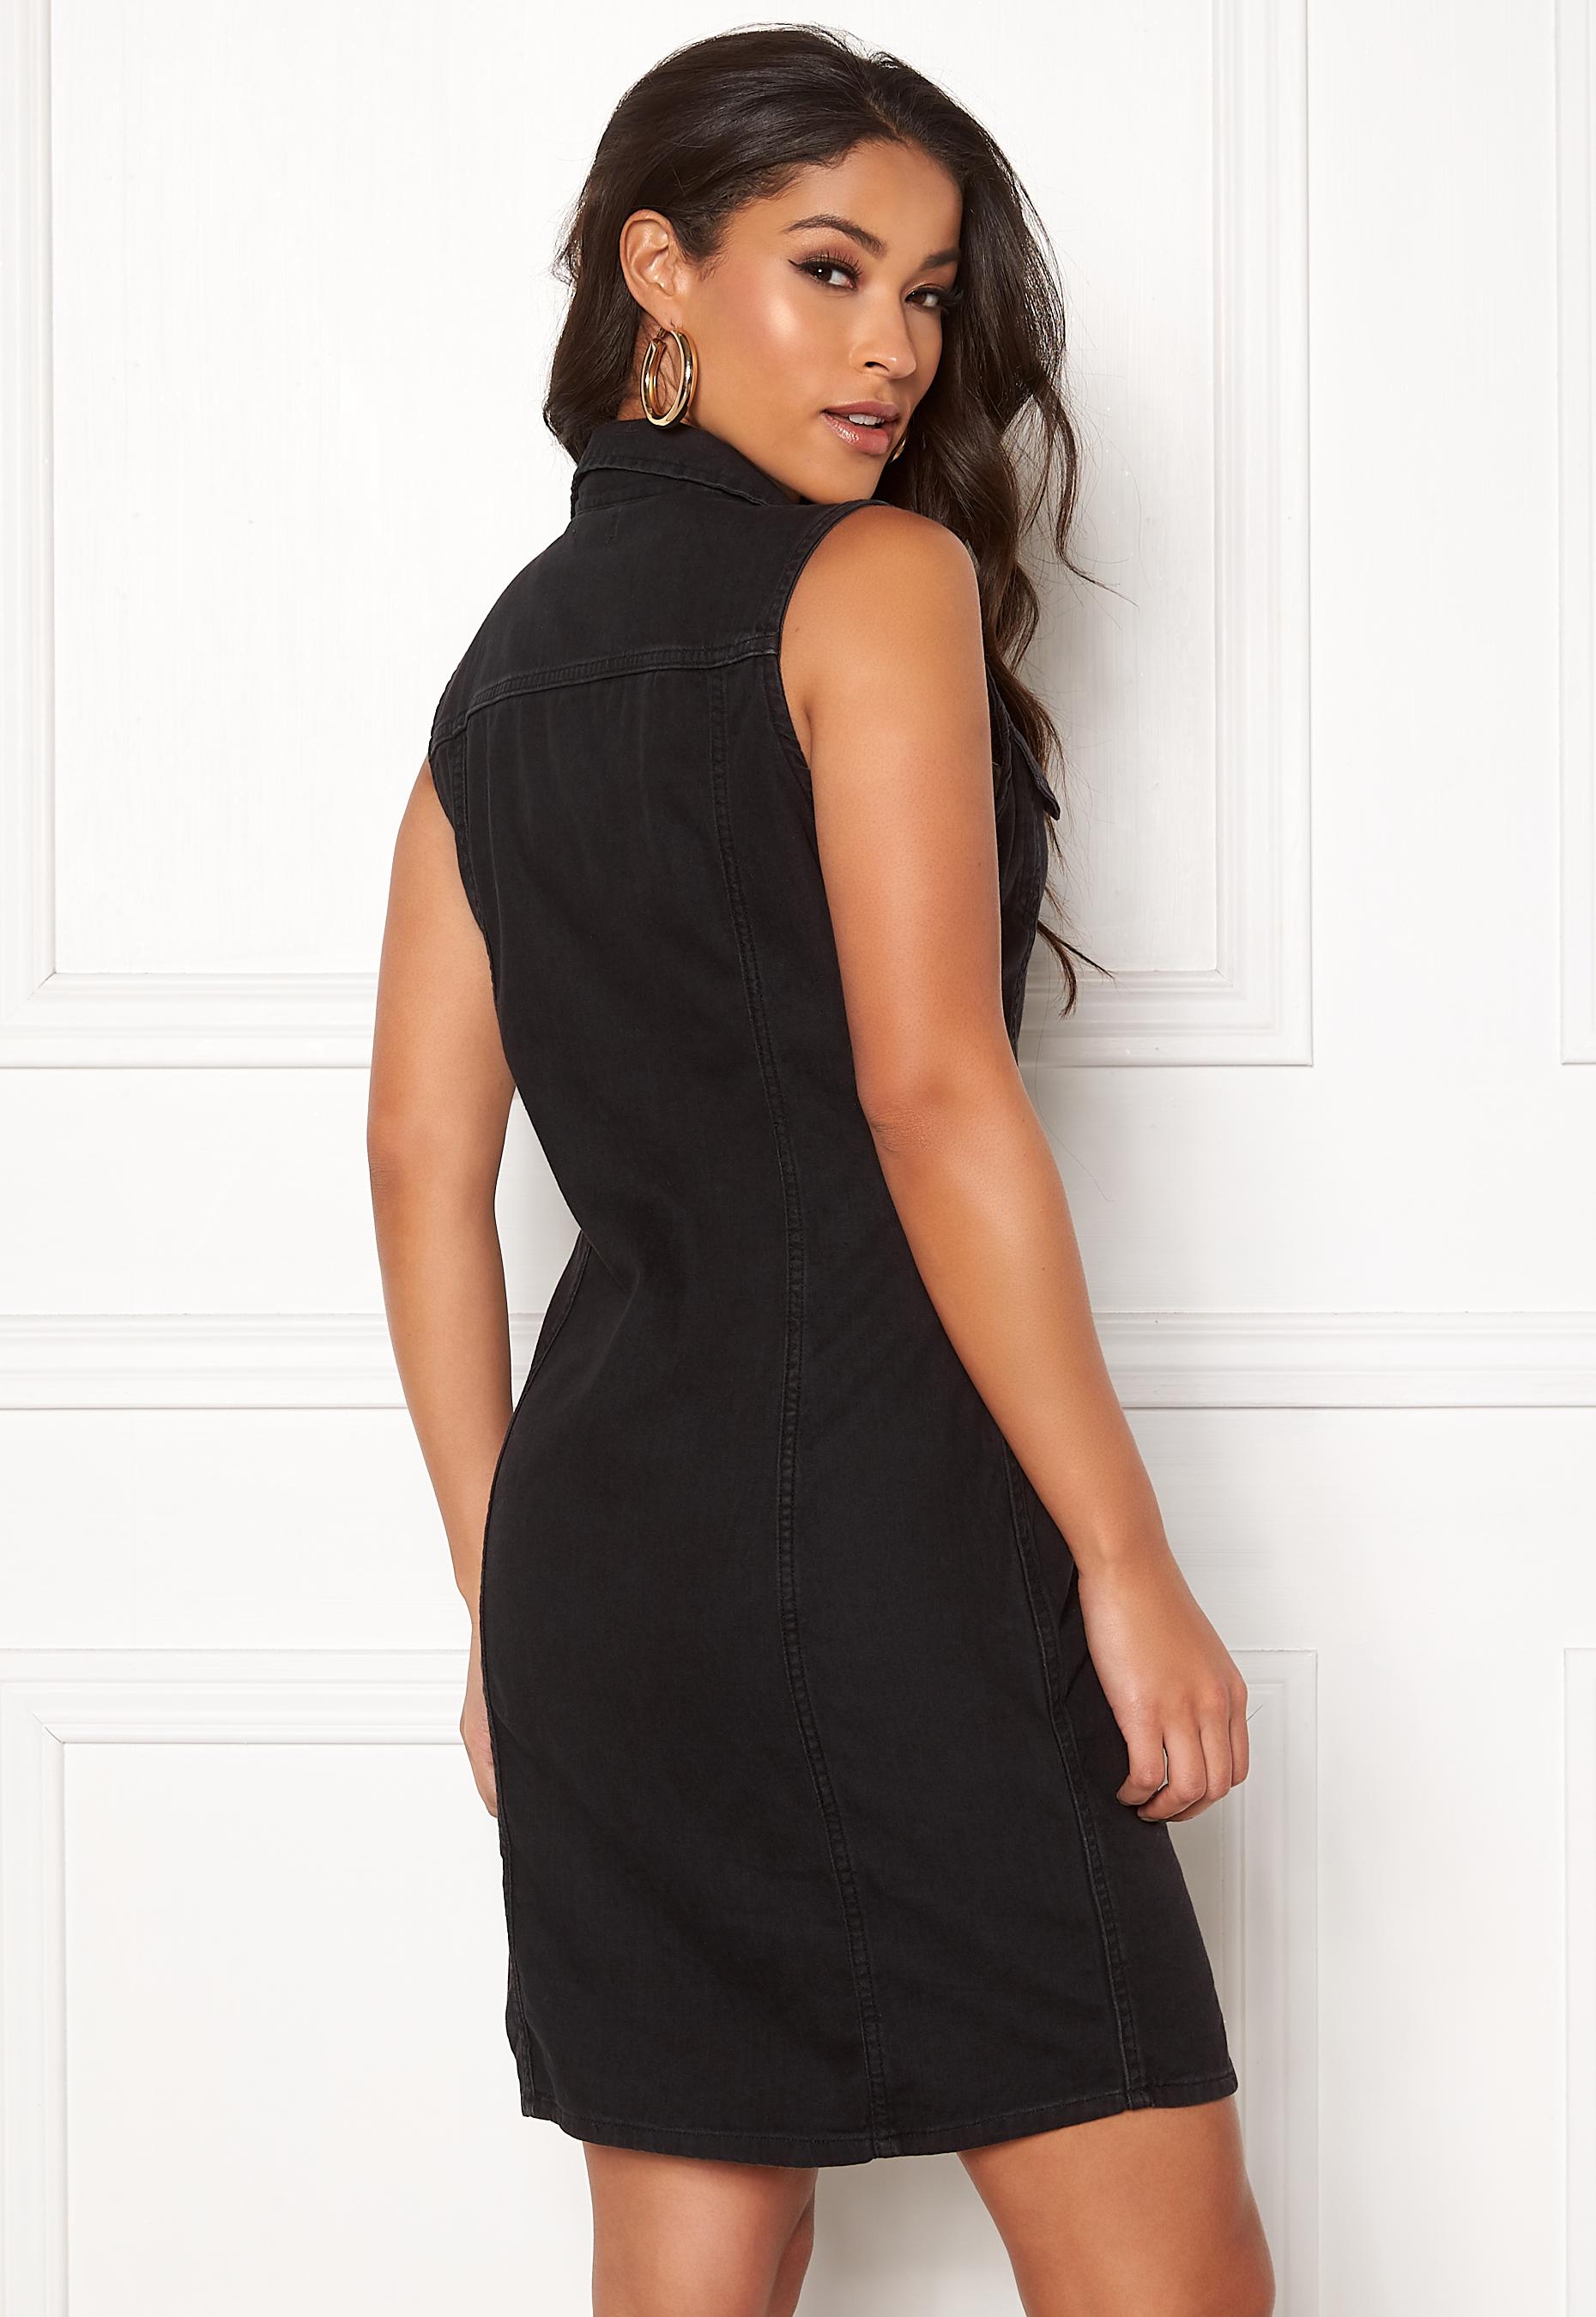 dfd5bb44a LEVI'S SL Short Aubrey Dress 0001 Shiny Happy Peo - Bubbleroom